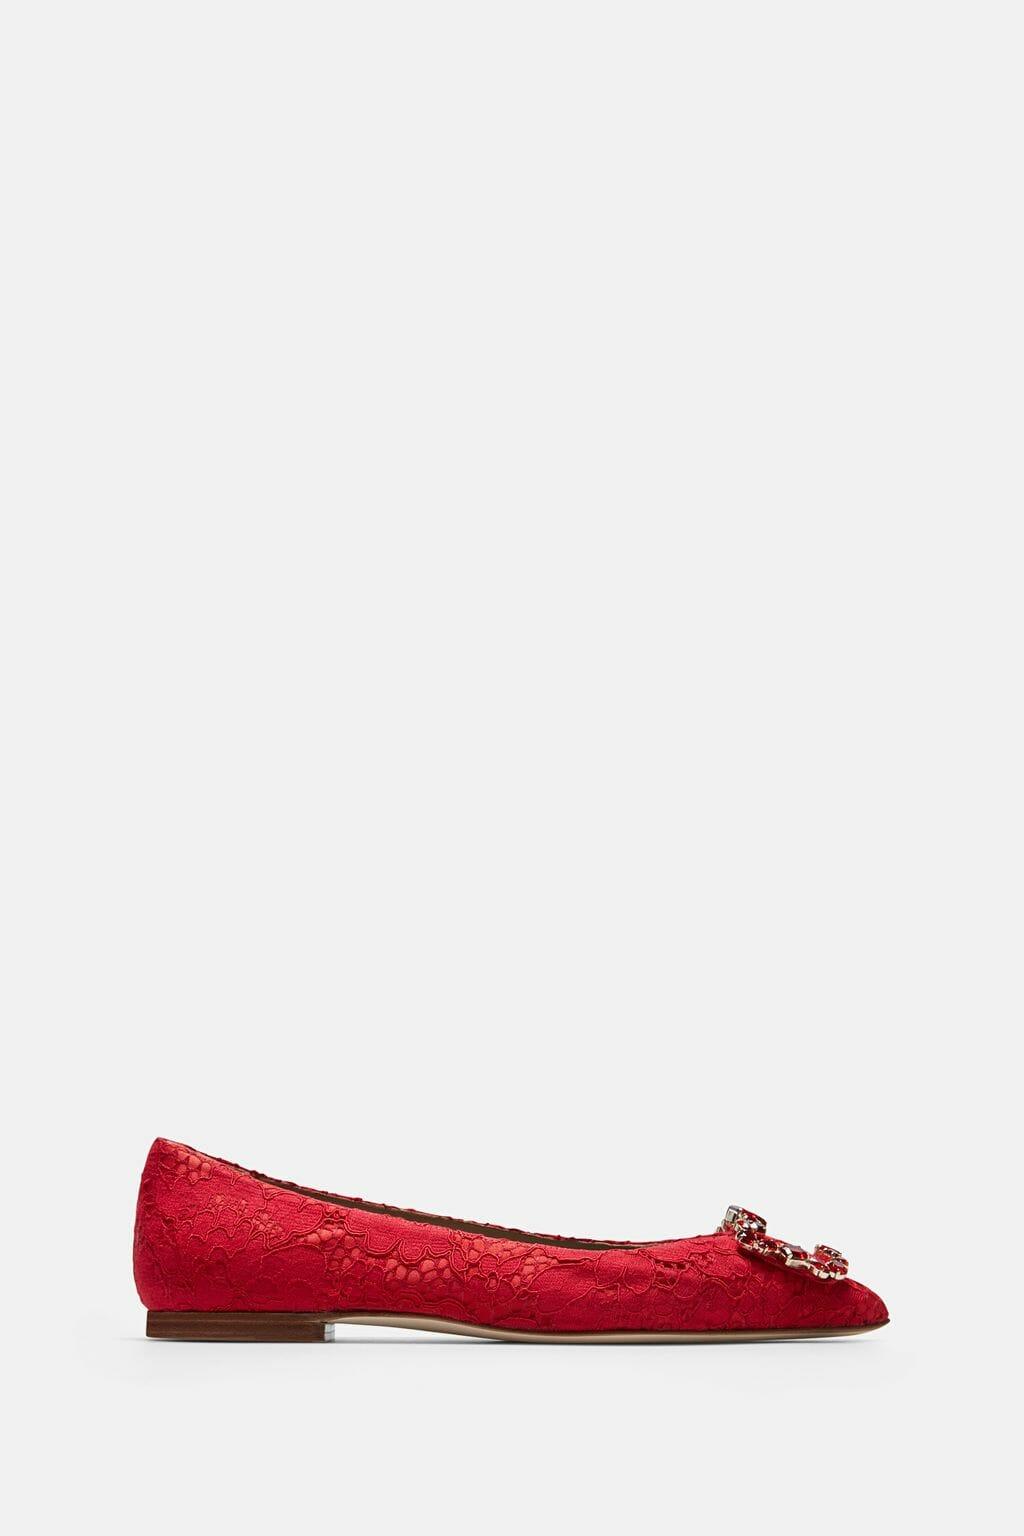 CH-Carolina-herrera-shoes-collection-Spring-Summer-2018-shoe-31